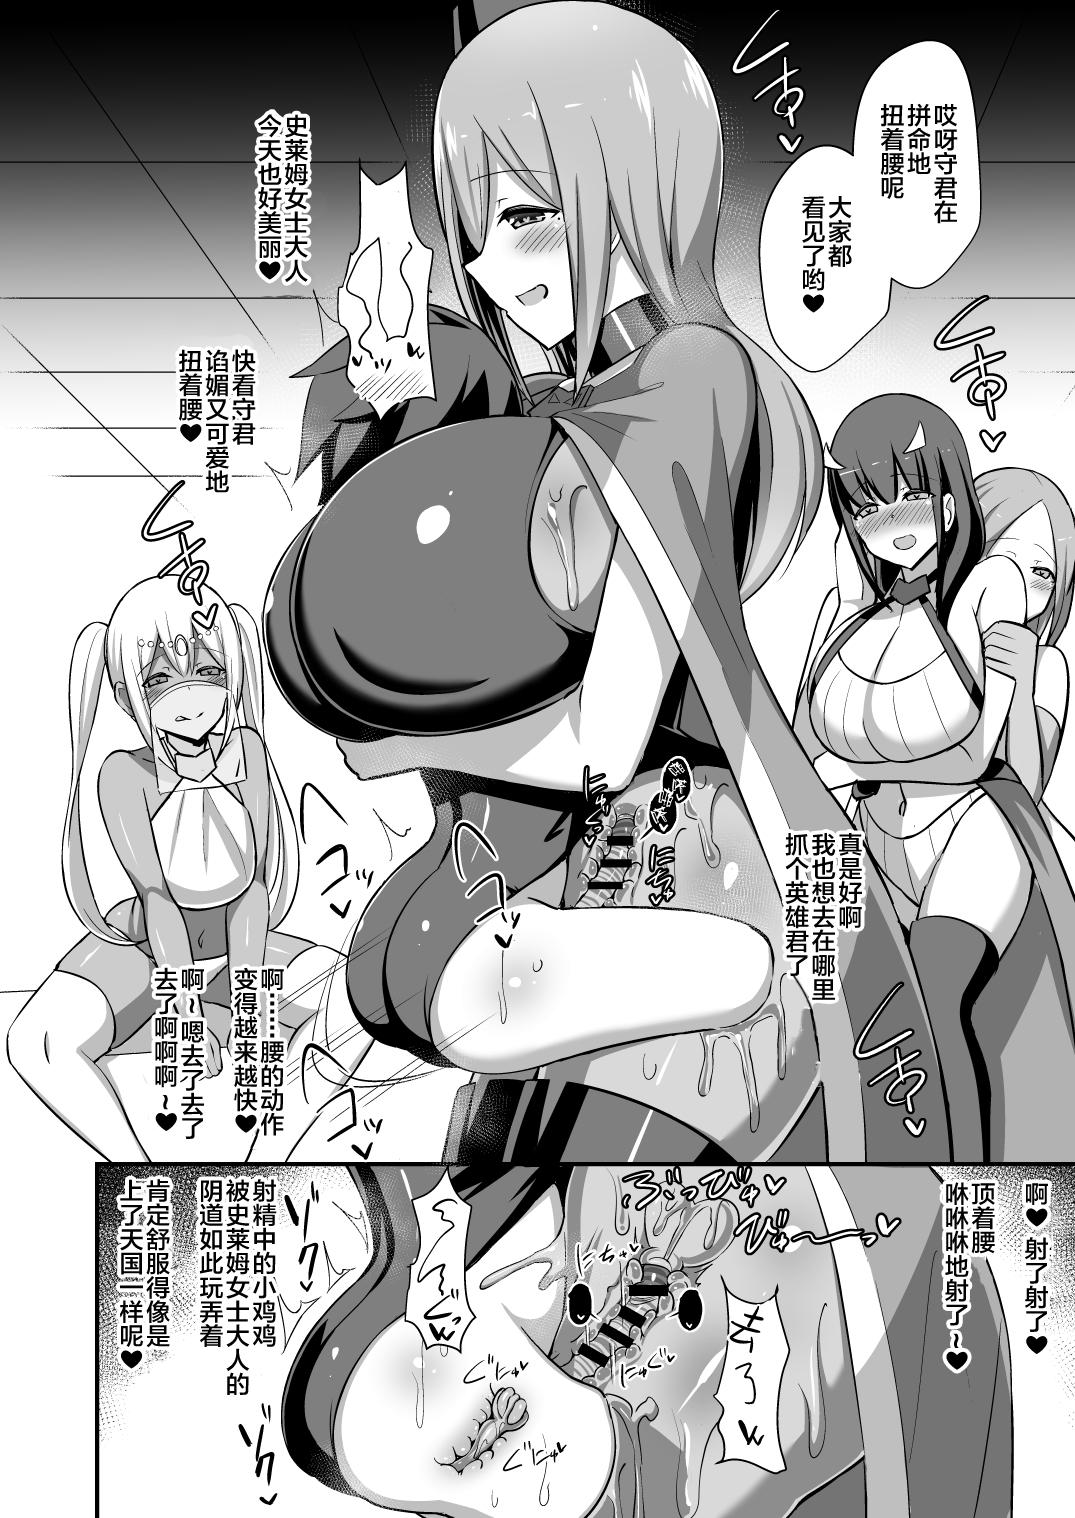 Aku no Onna Kanbu Slime Lady no Yuuwaku 26